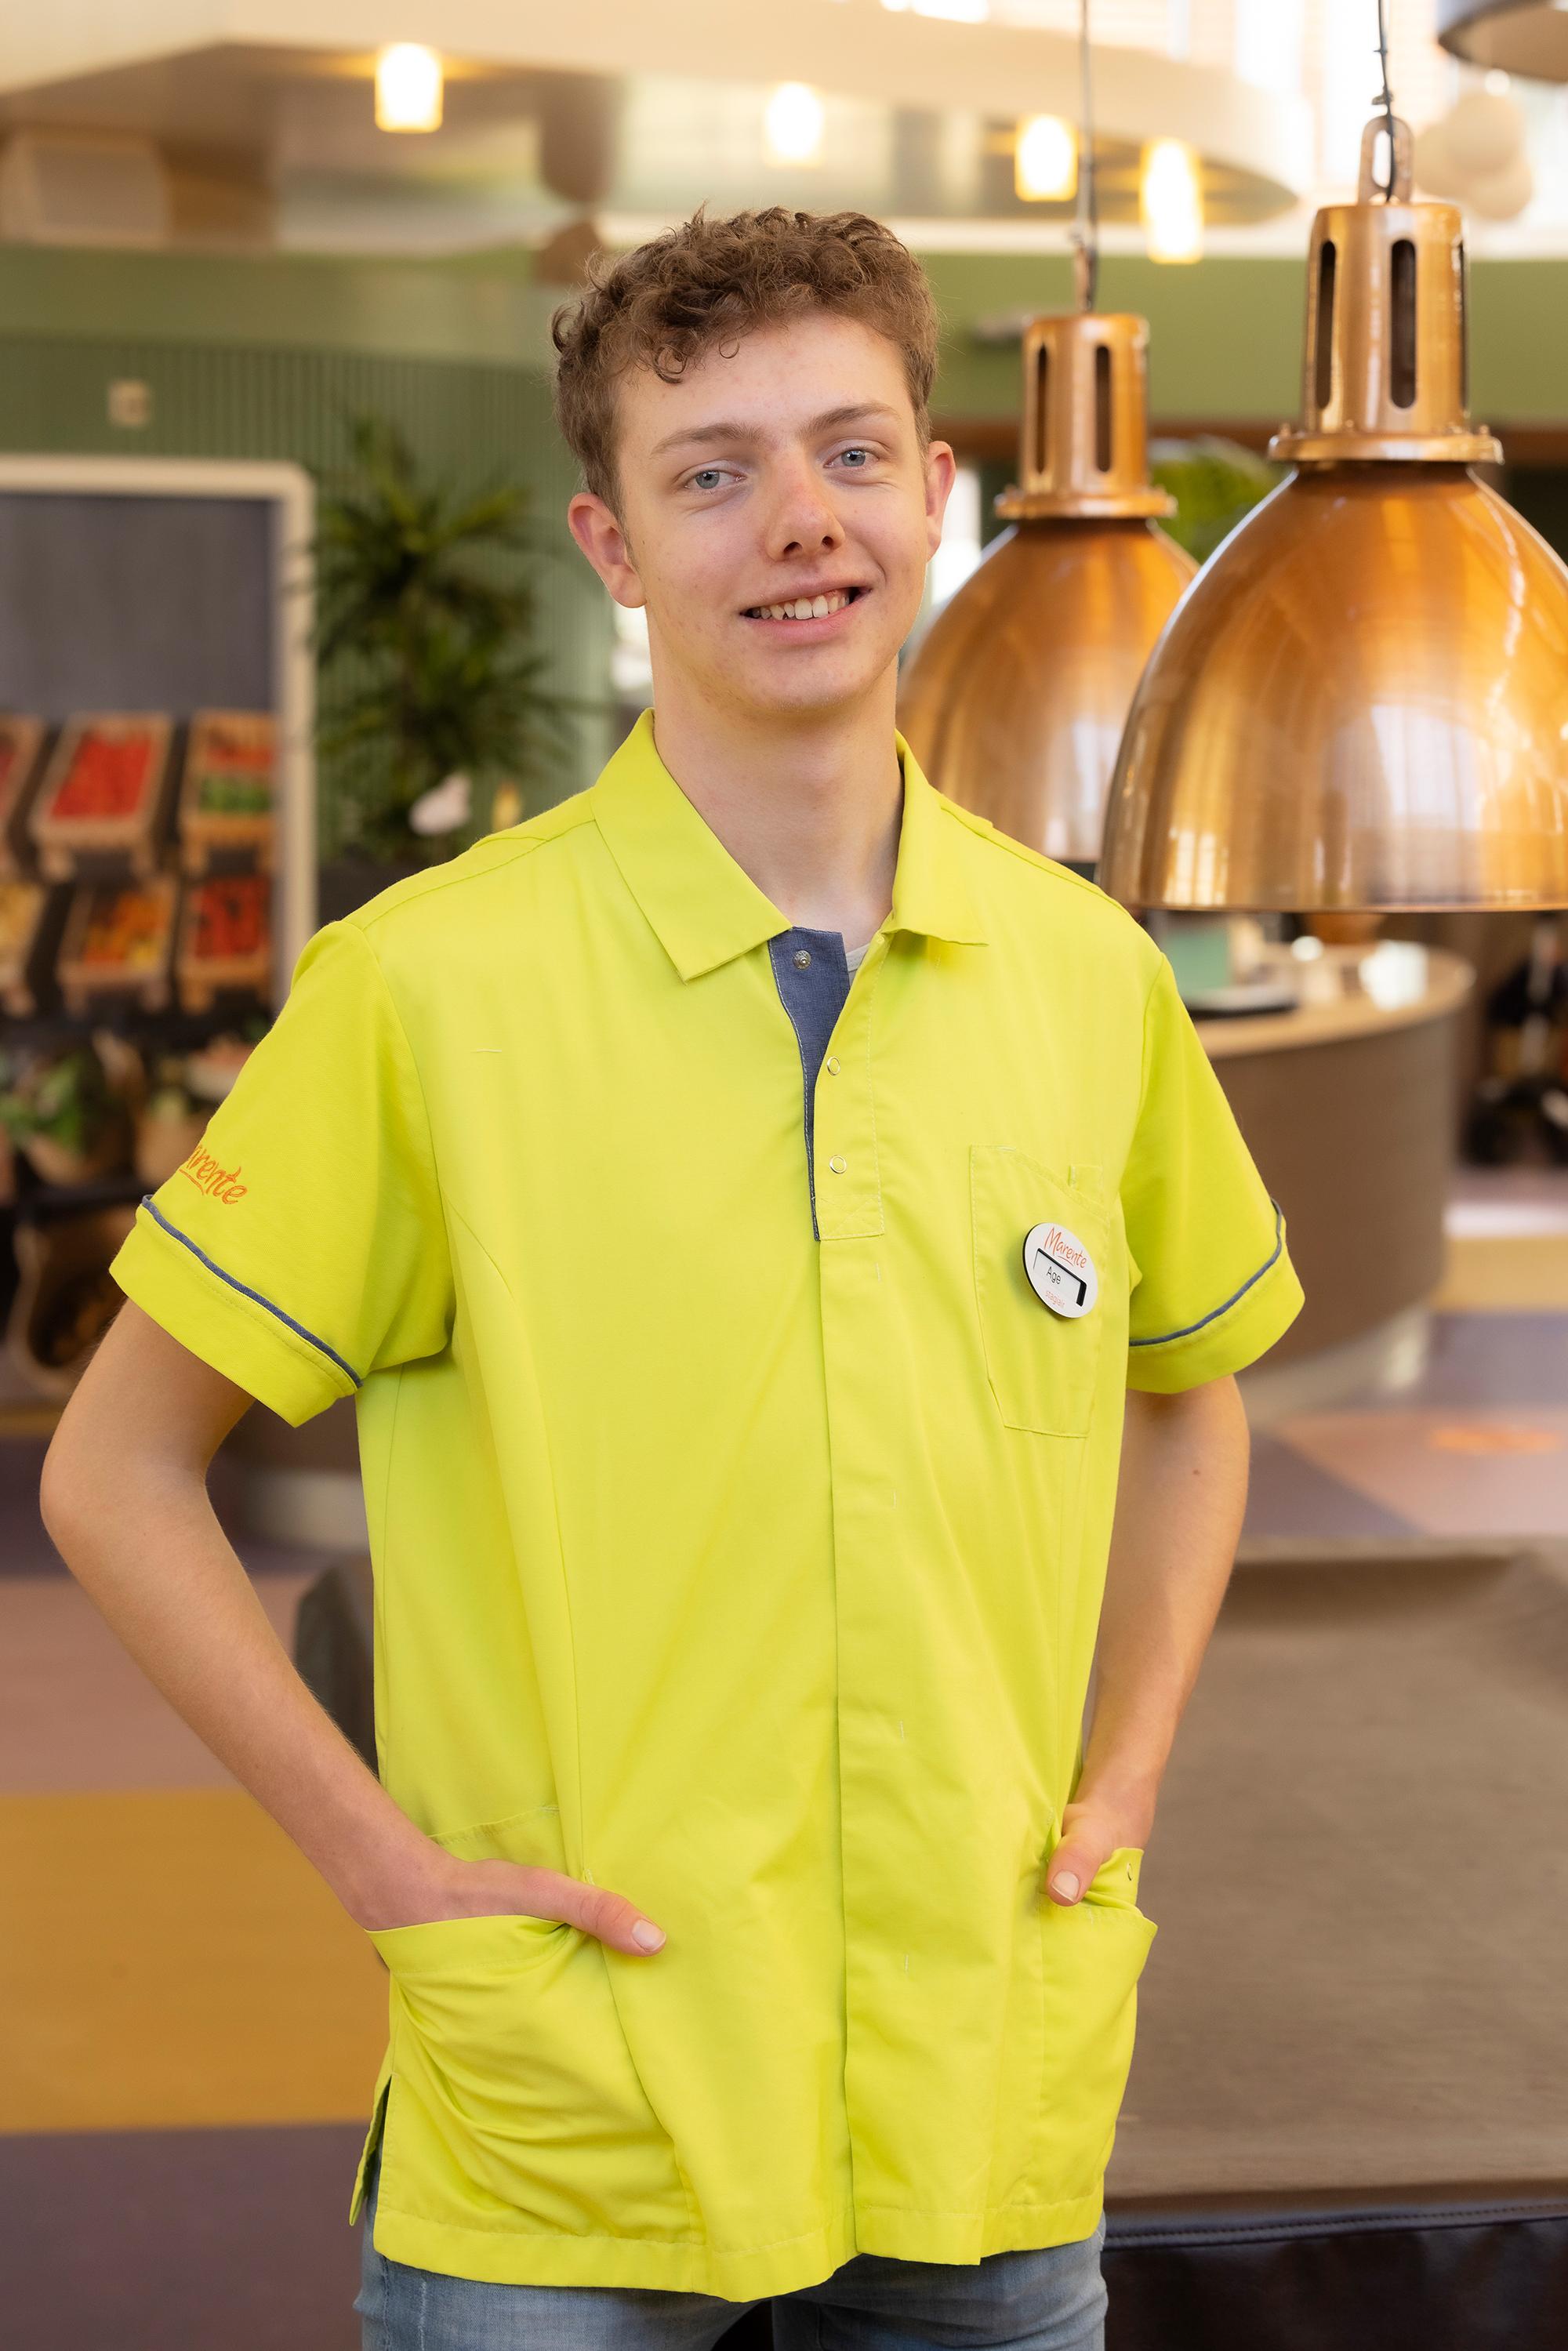 Age - hbo-verpleegkunde student Bernardus Sassenheim - Marente